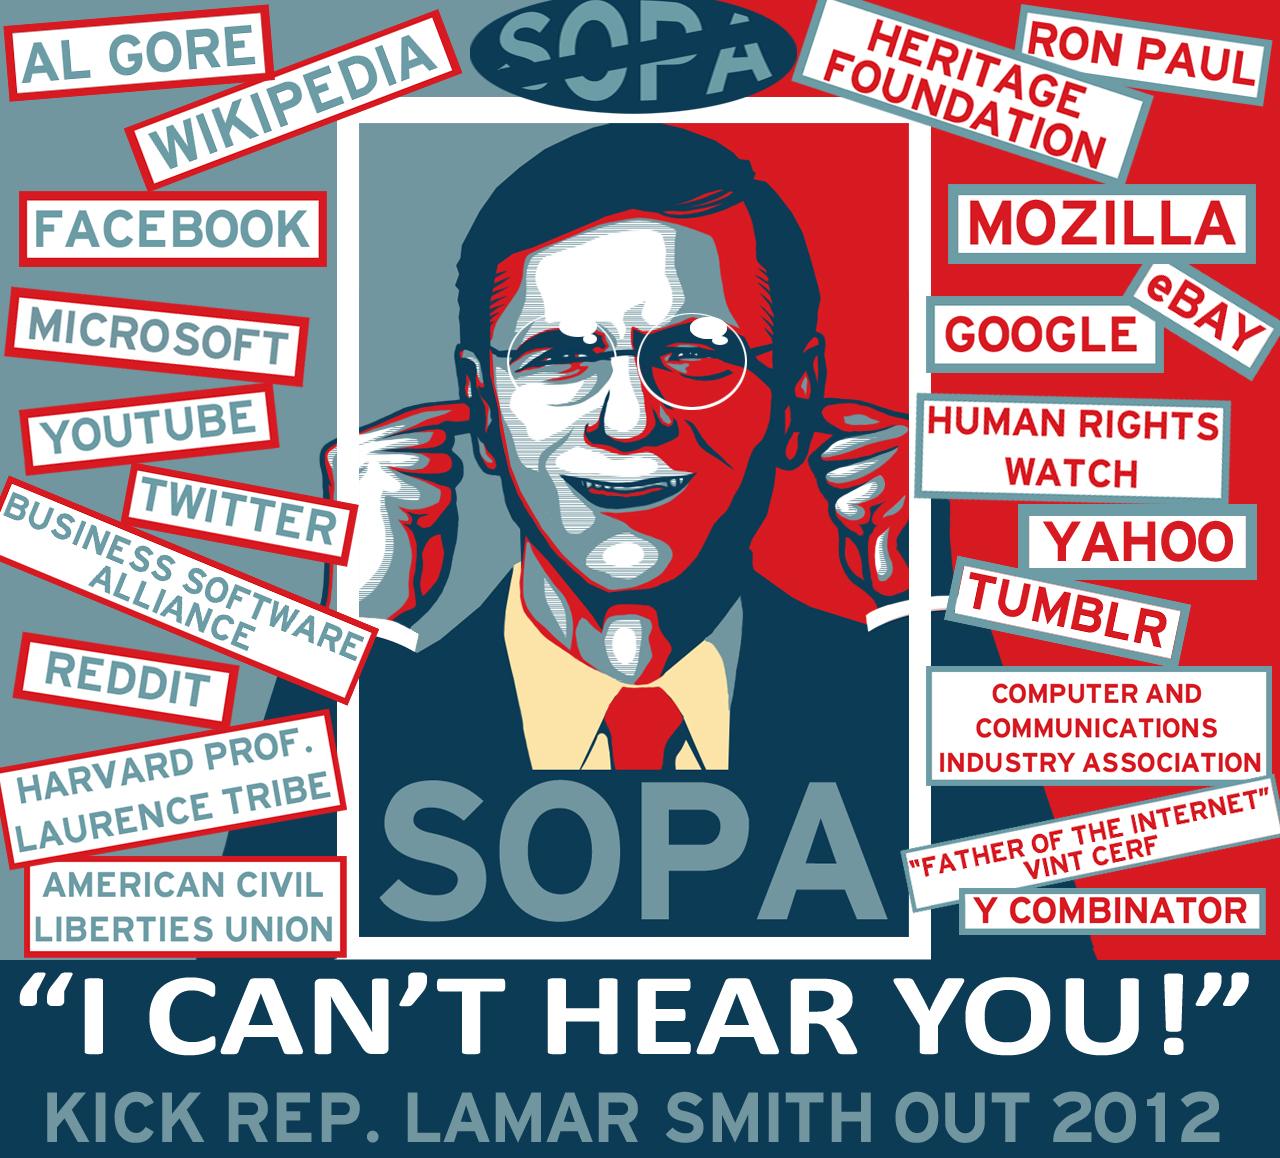 SOPA - I CAN'T HEAR YOU